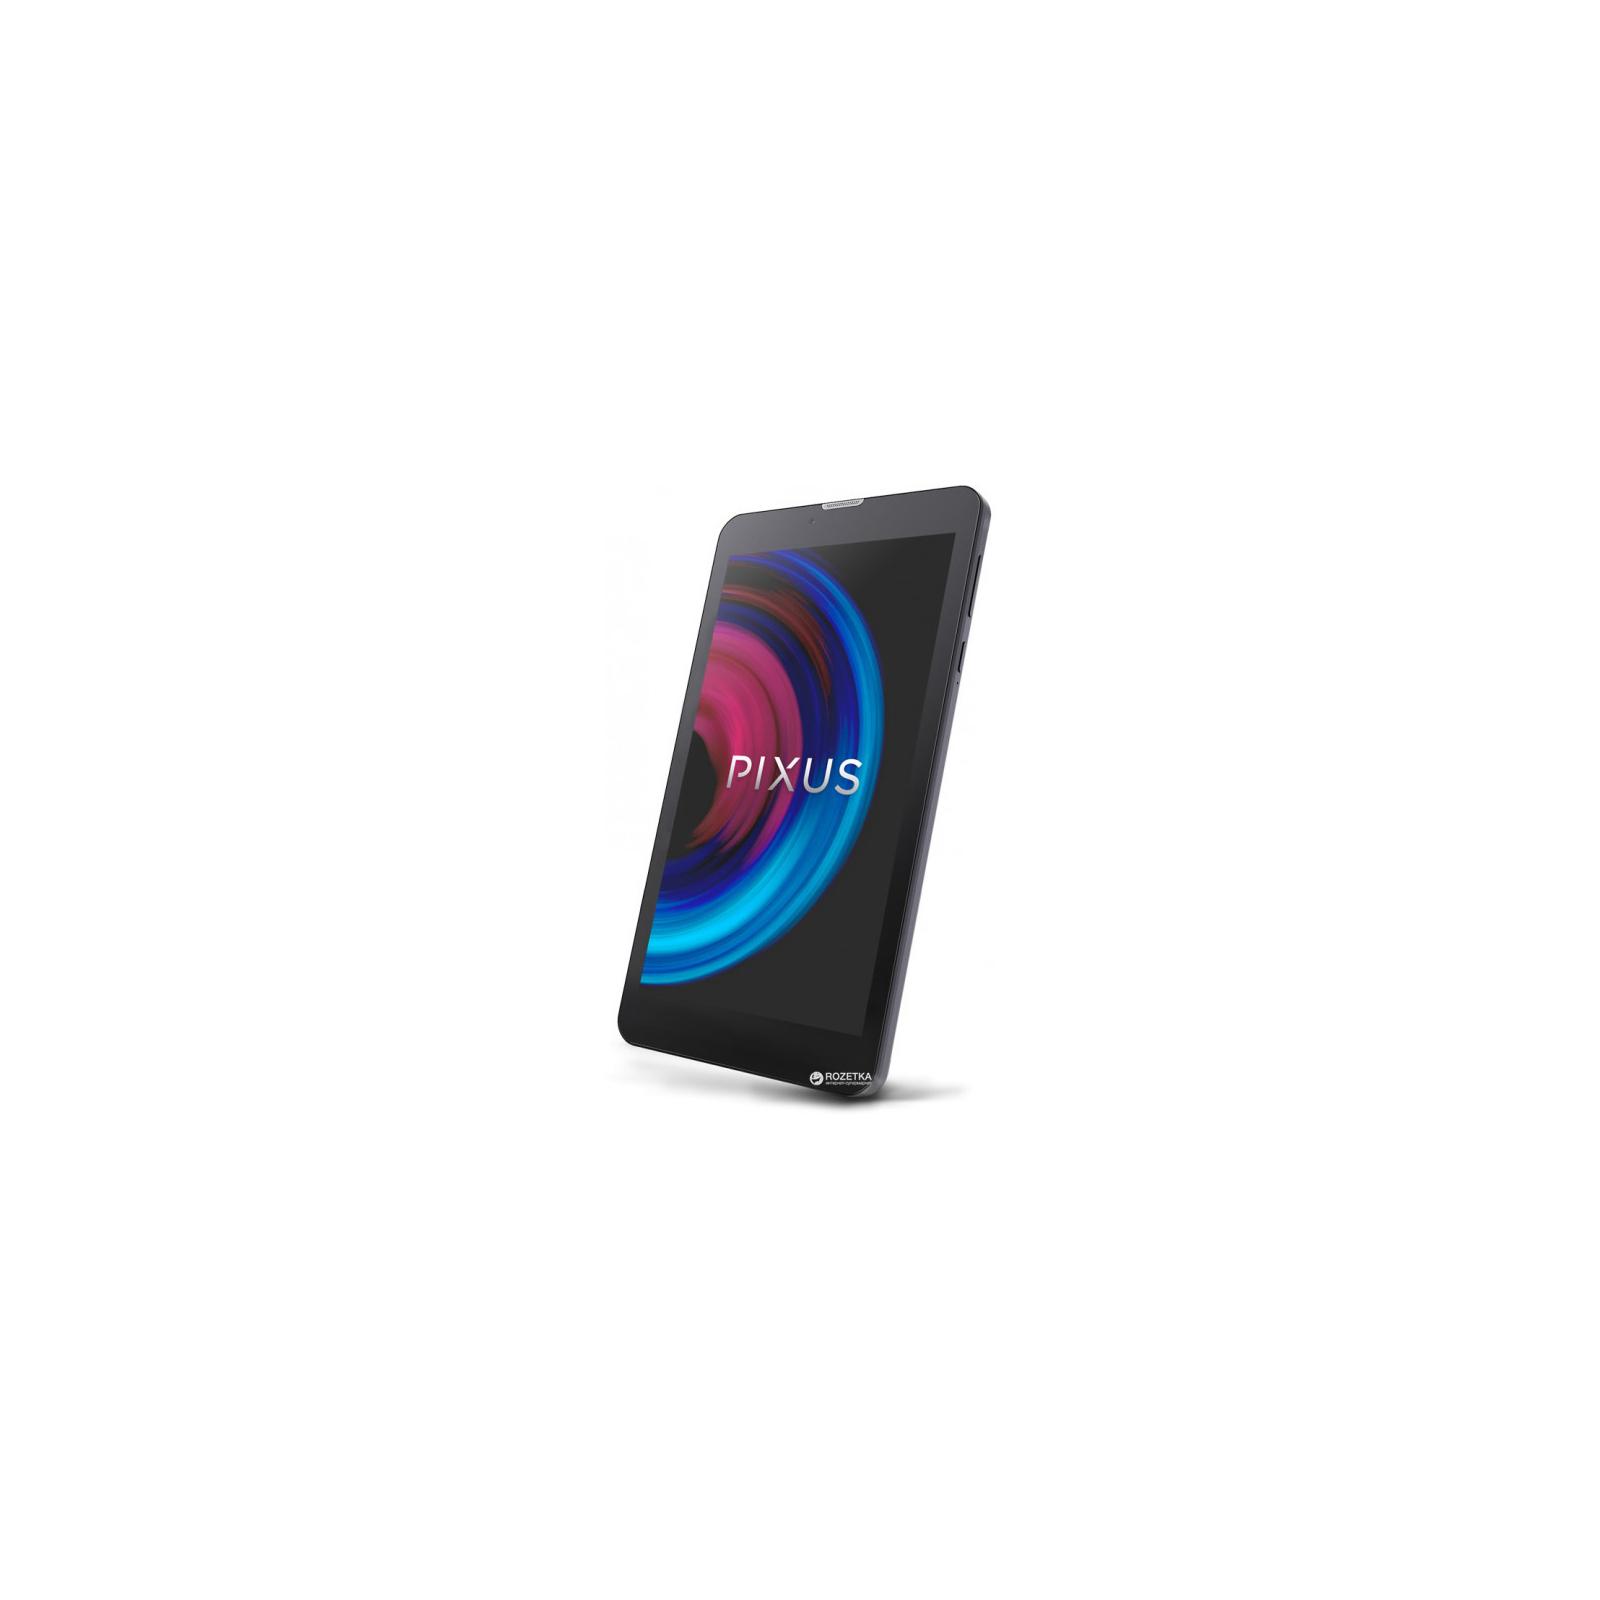 Планшет Pixus Touch 7 3G (HD) 2/16GB Metal, Black (4897058531213) изображение 2